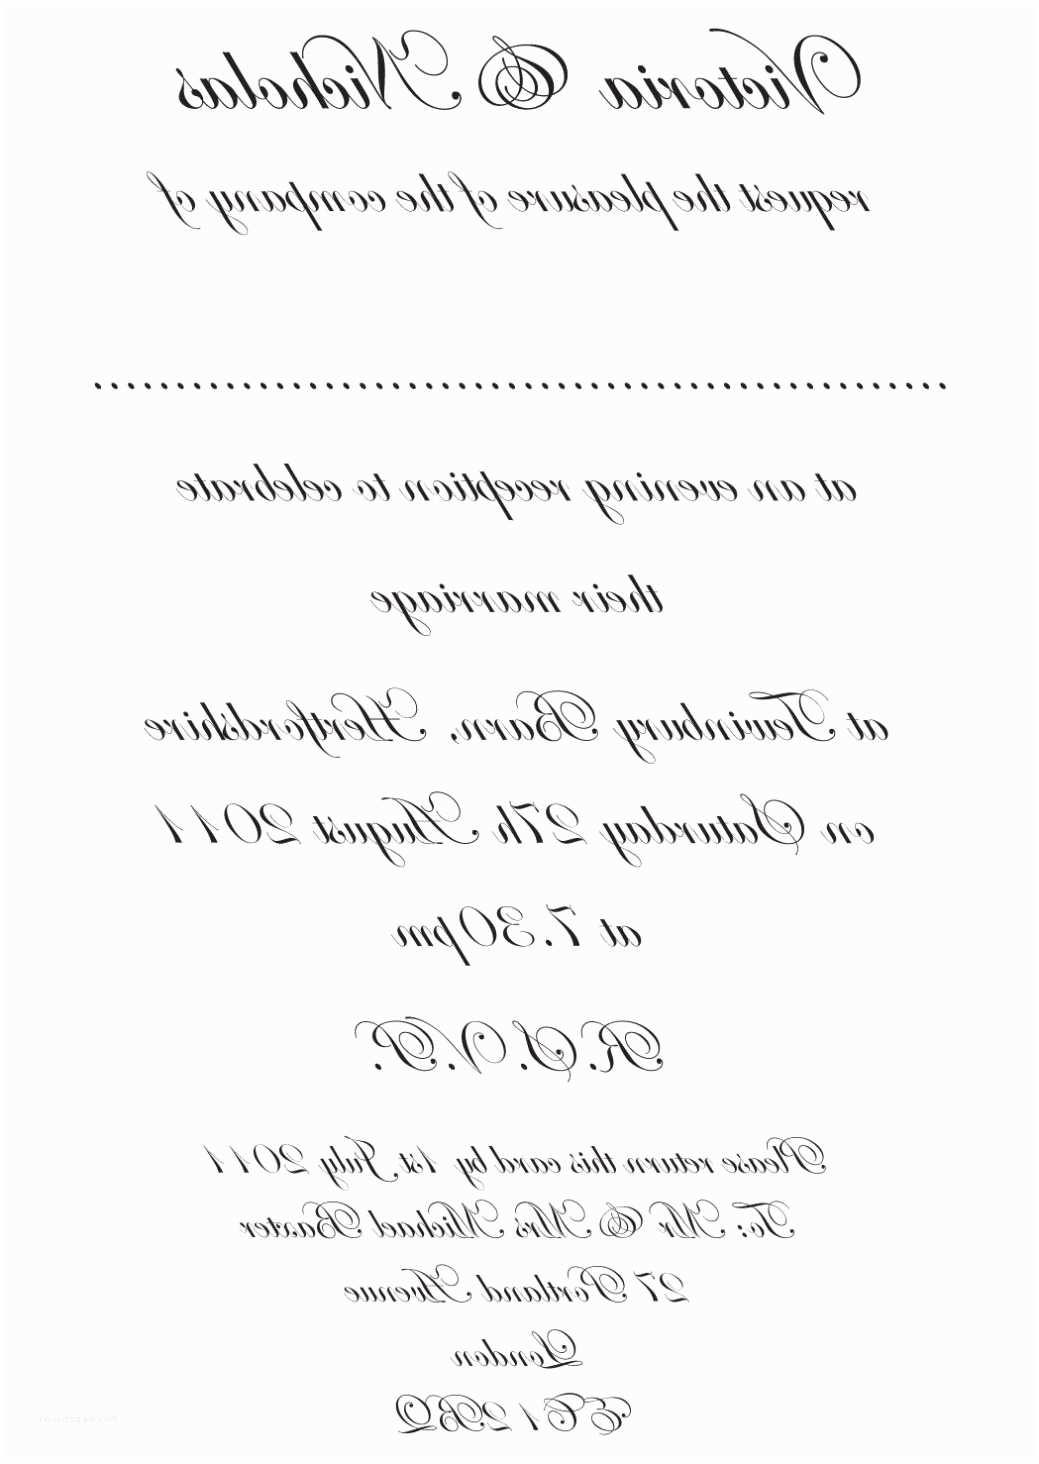 Jewish Wedding Invitation Wording Samples Sample Text for Wedding Invitations